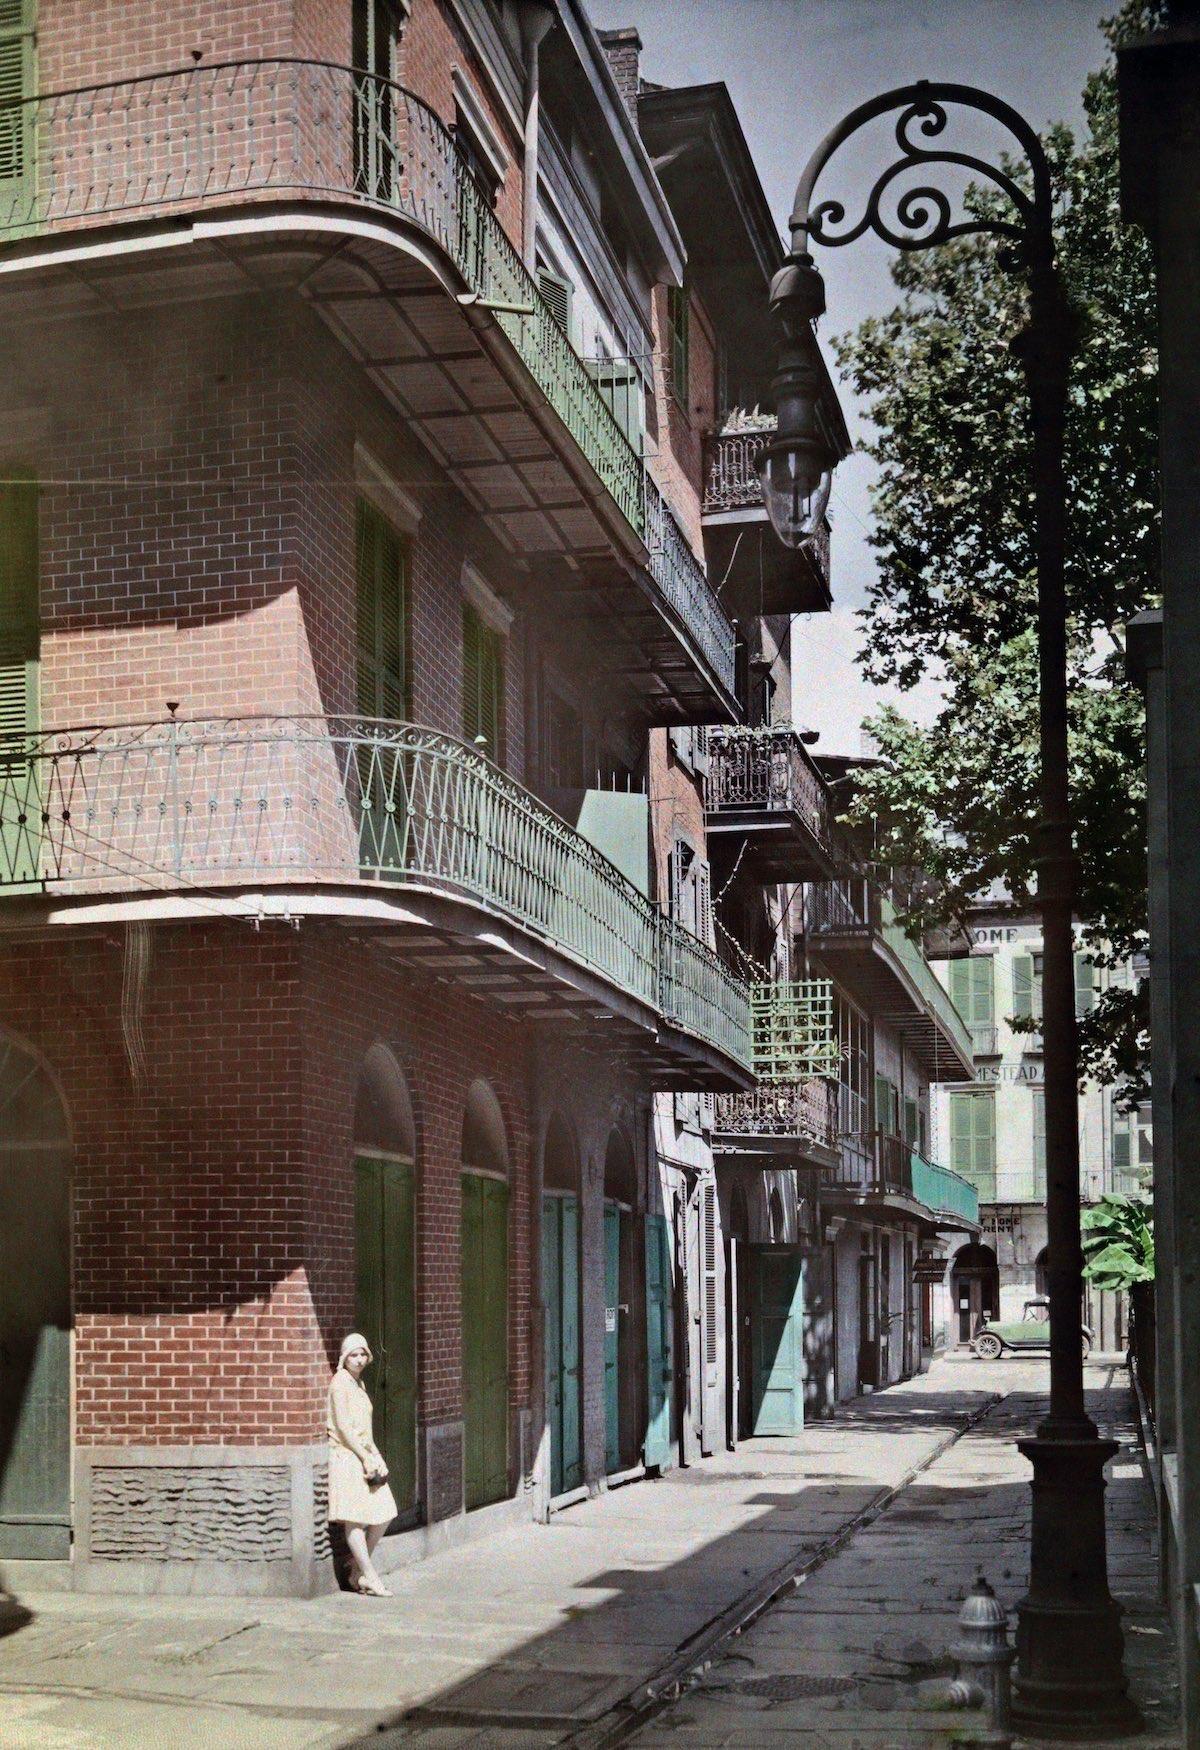 French Quarter, New Orlean 1920s